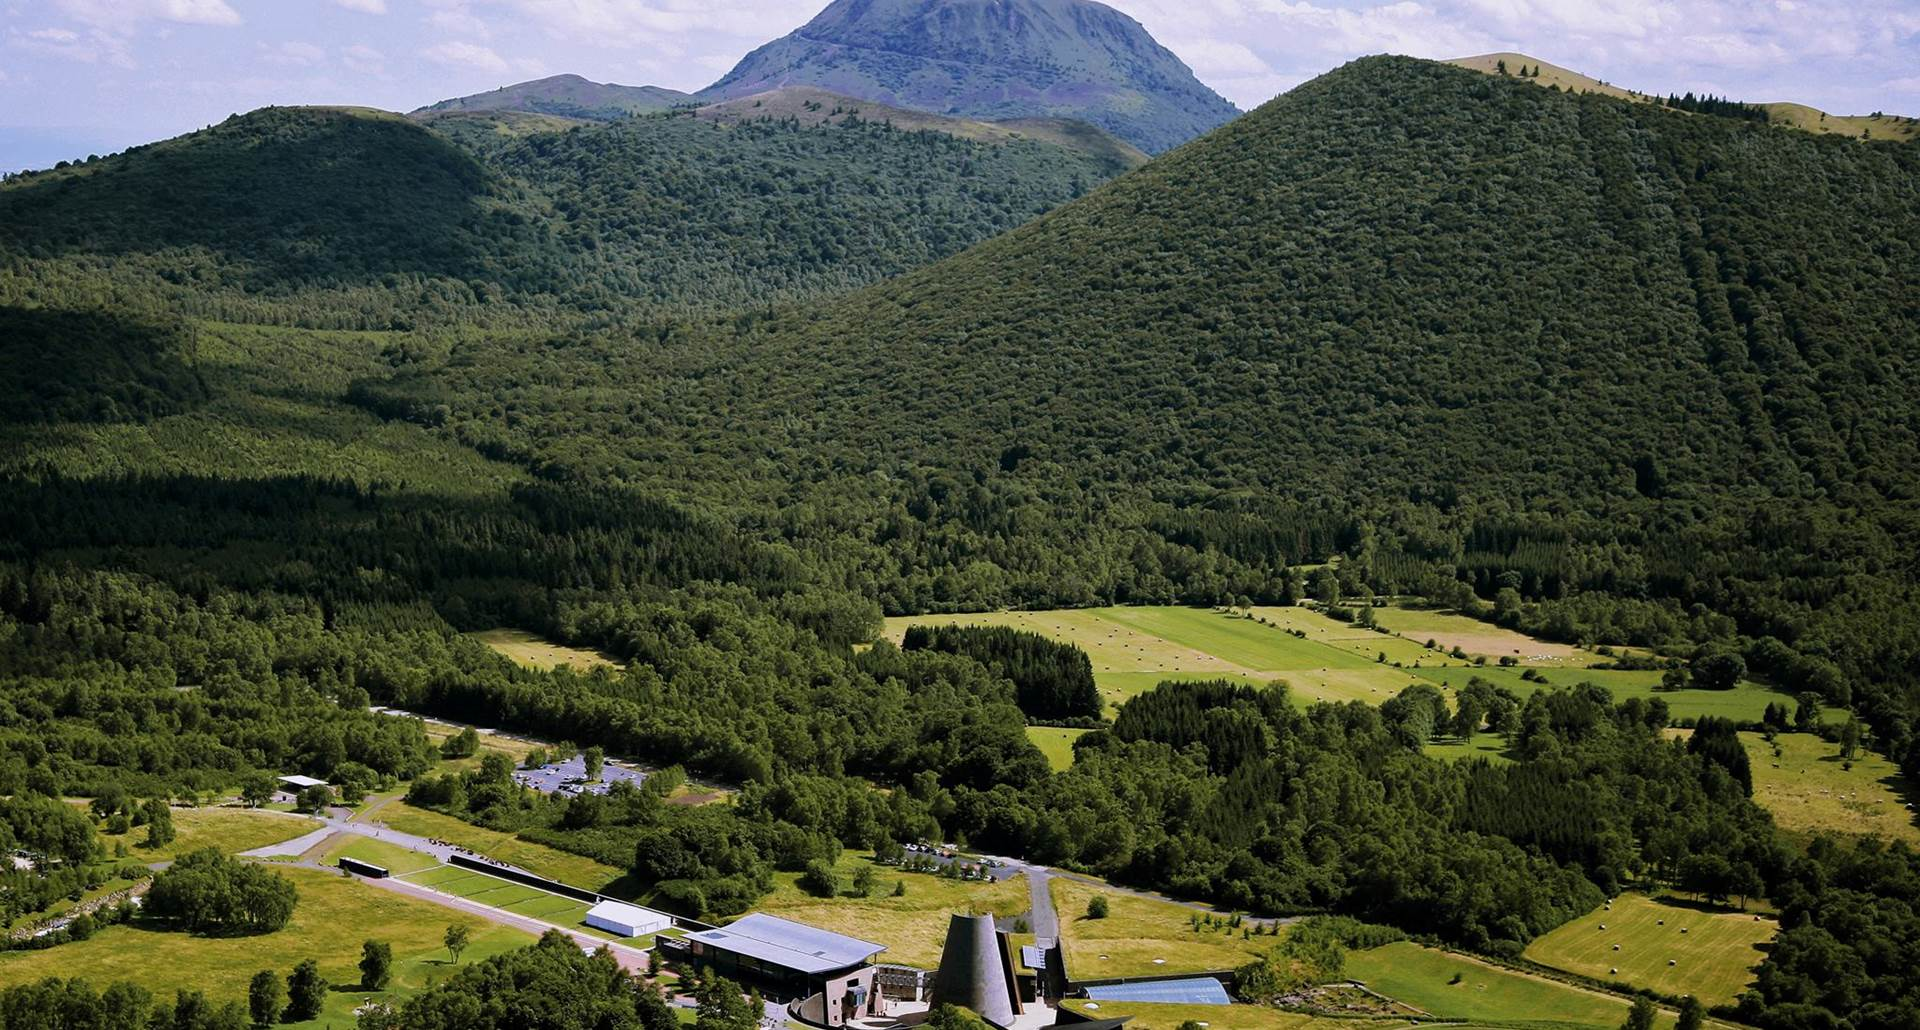 vulcania Volcans d'Auvergne UNESCO